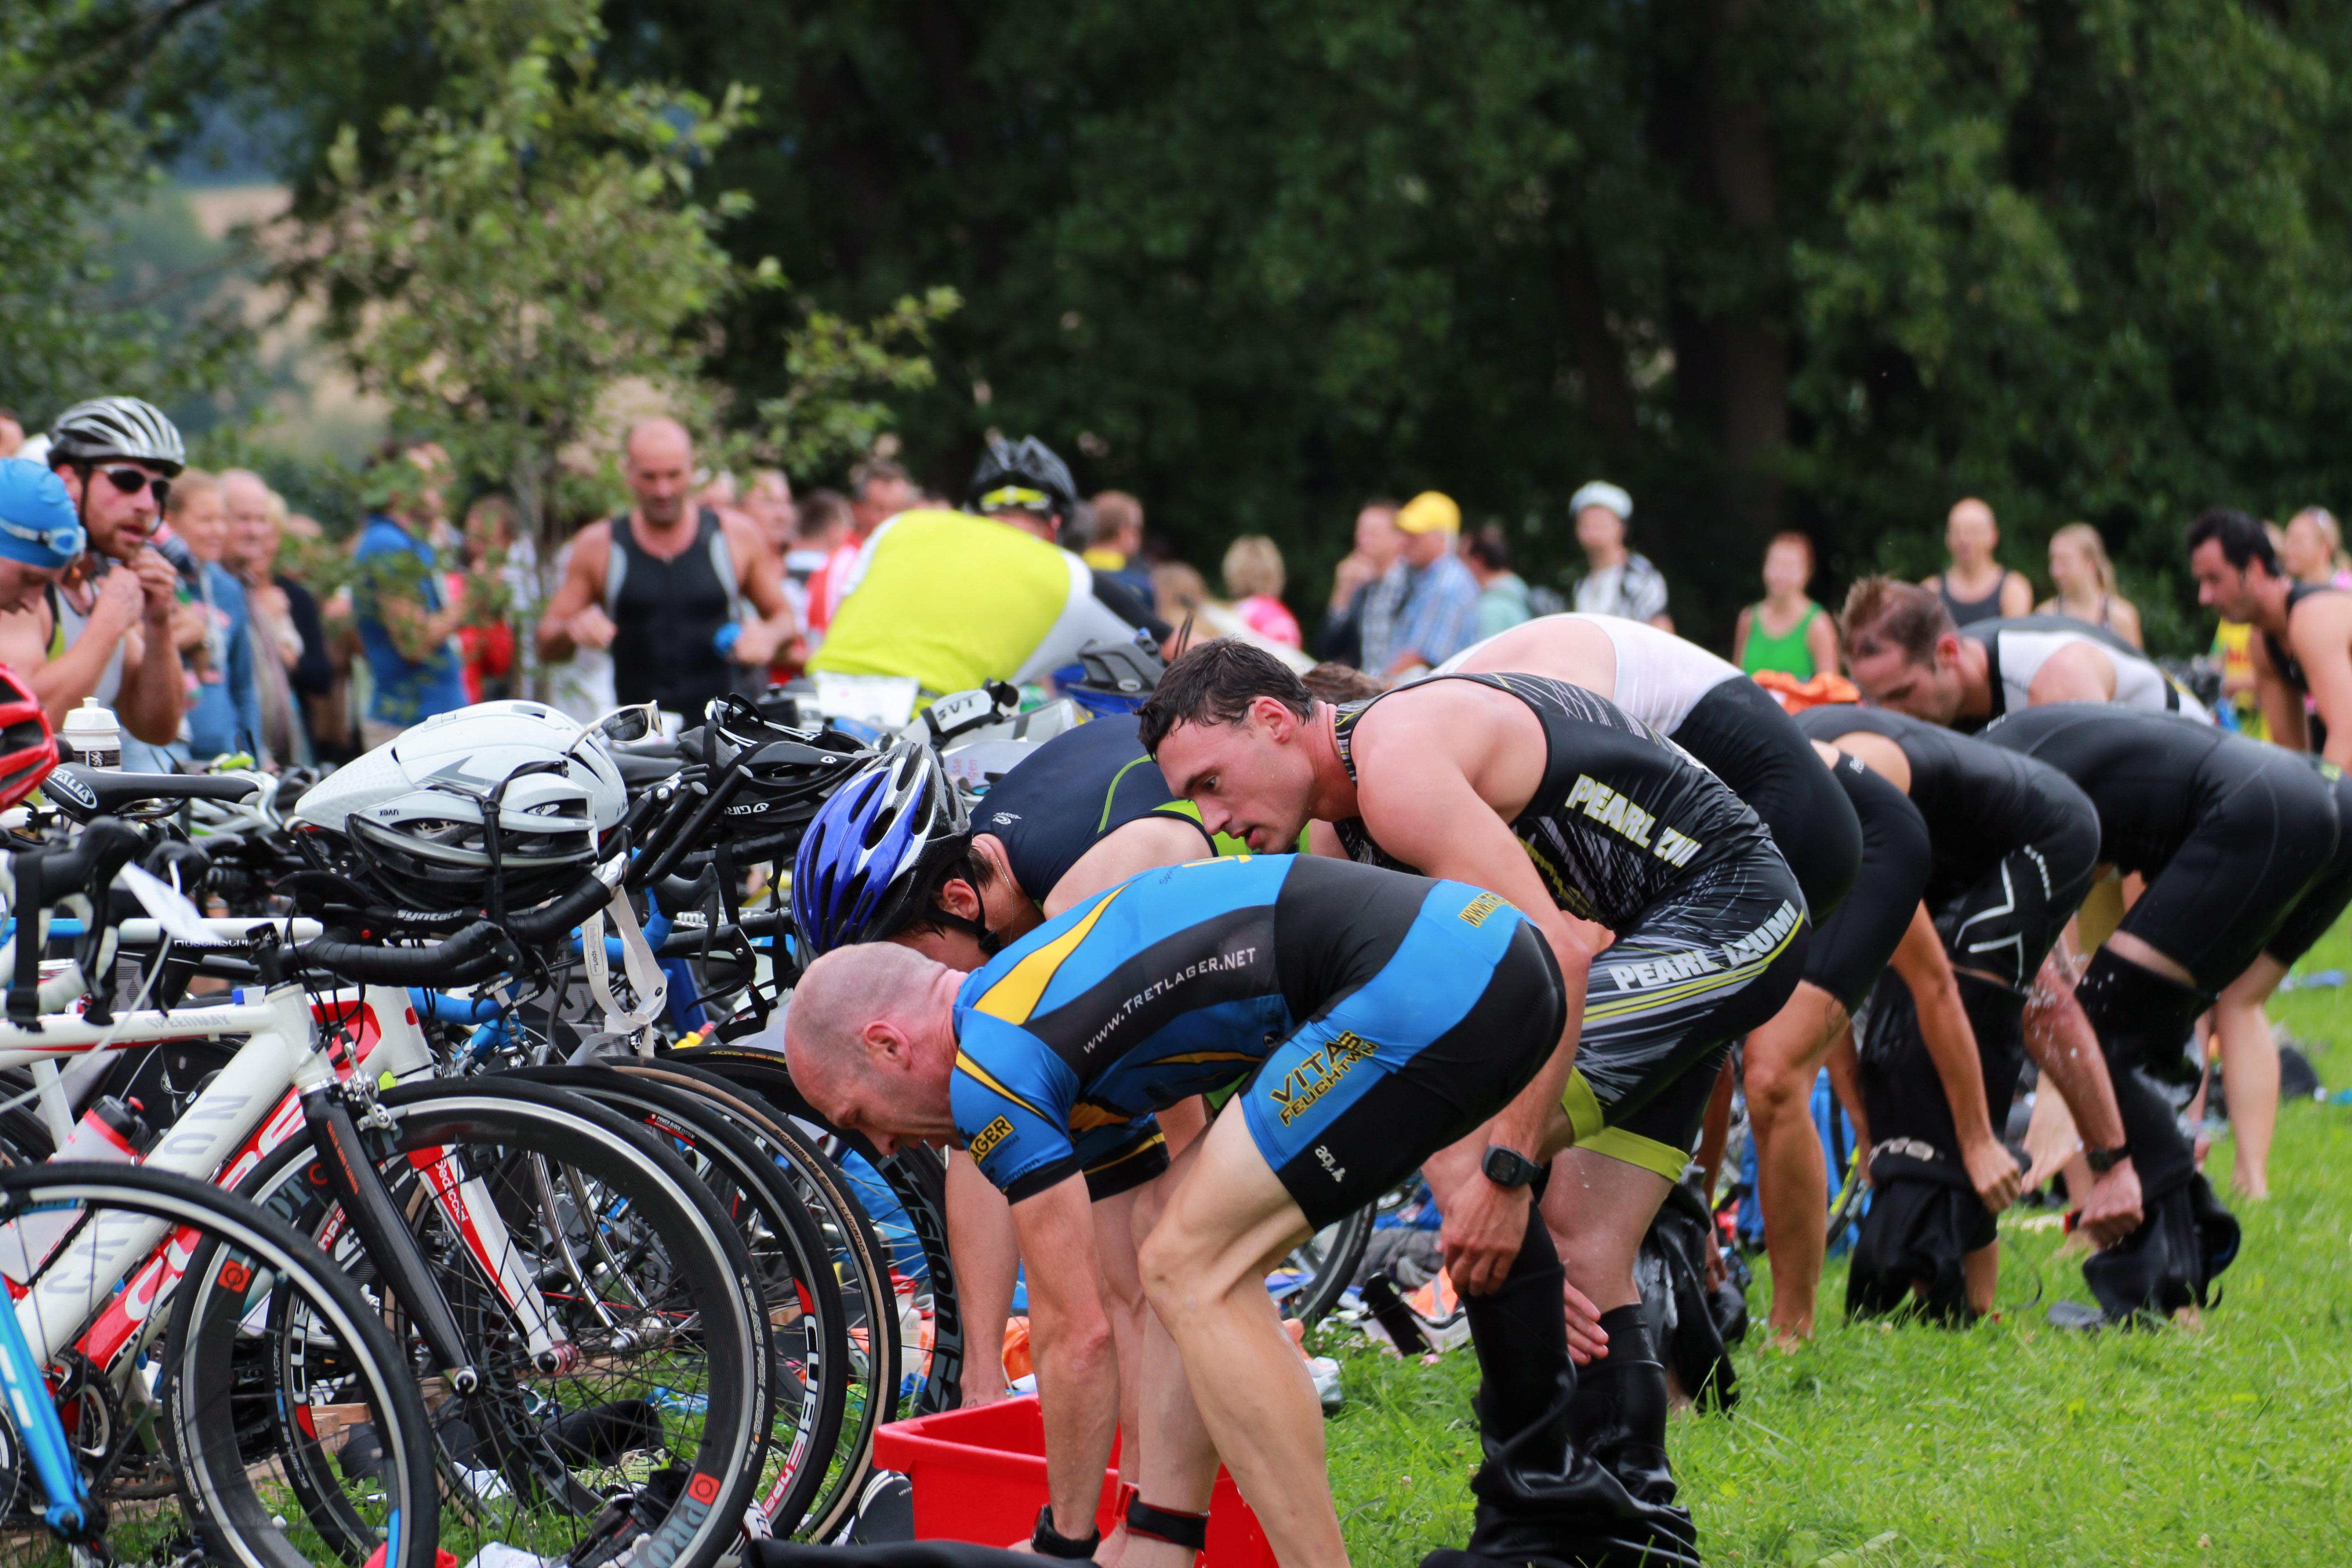 Top 5 mistakes Triathletes Make 4.26